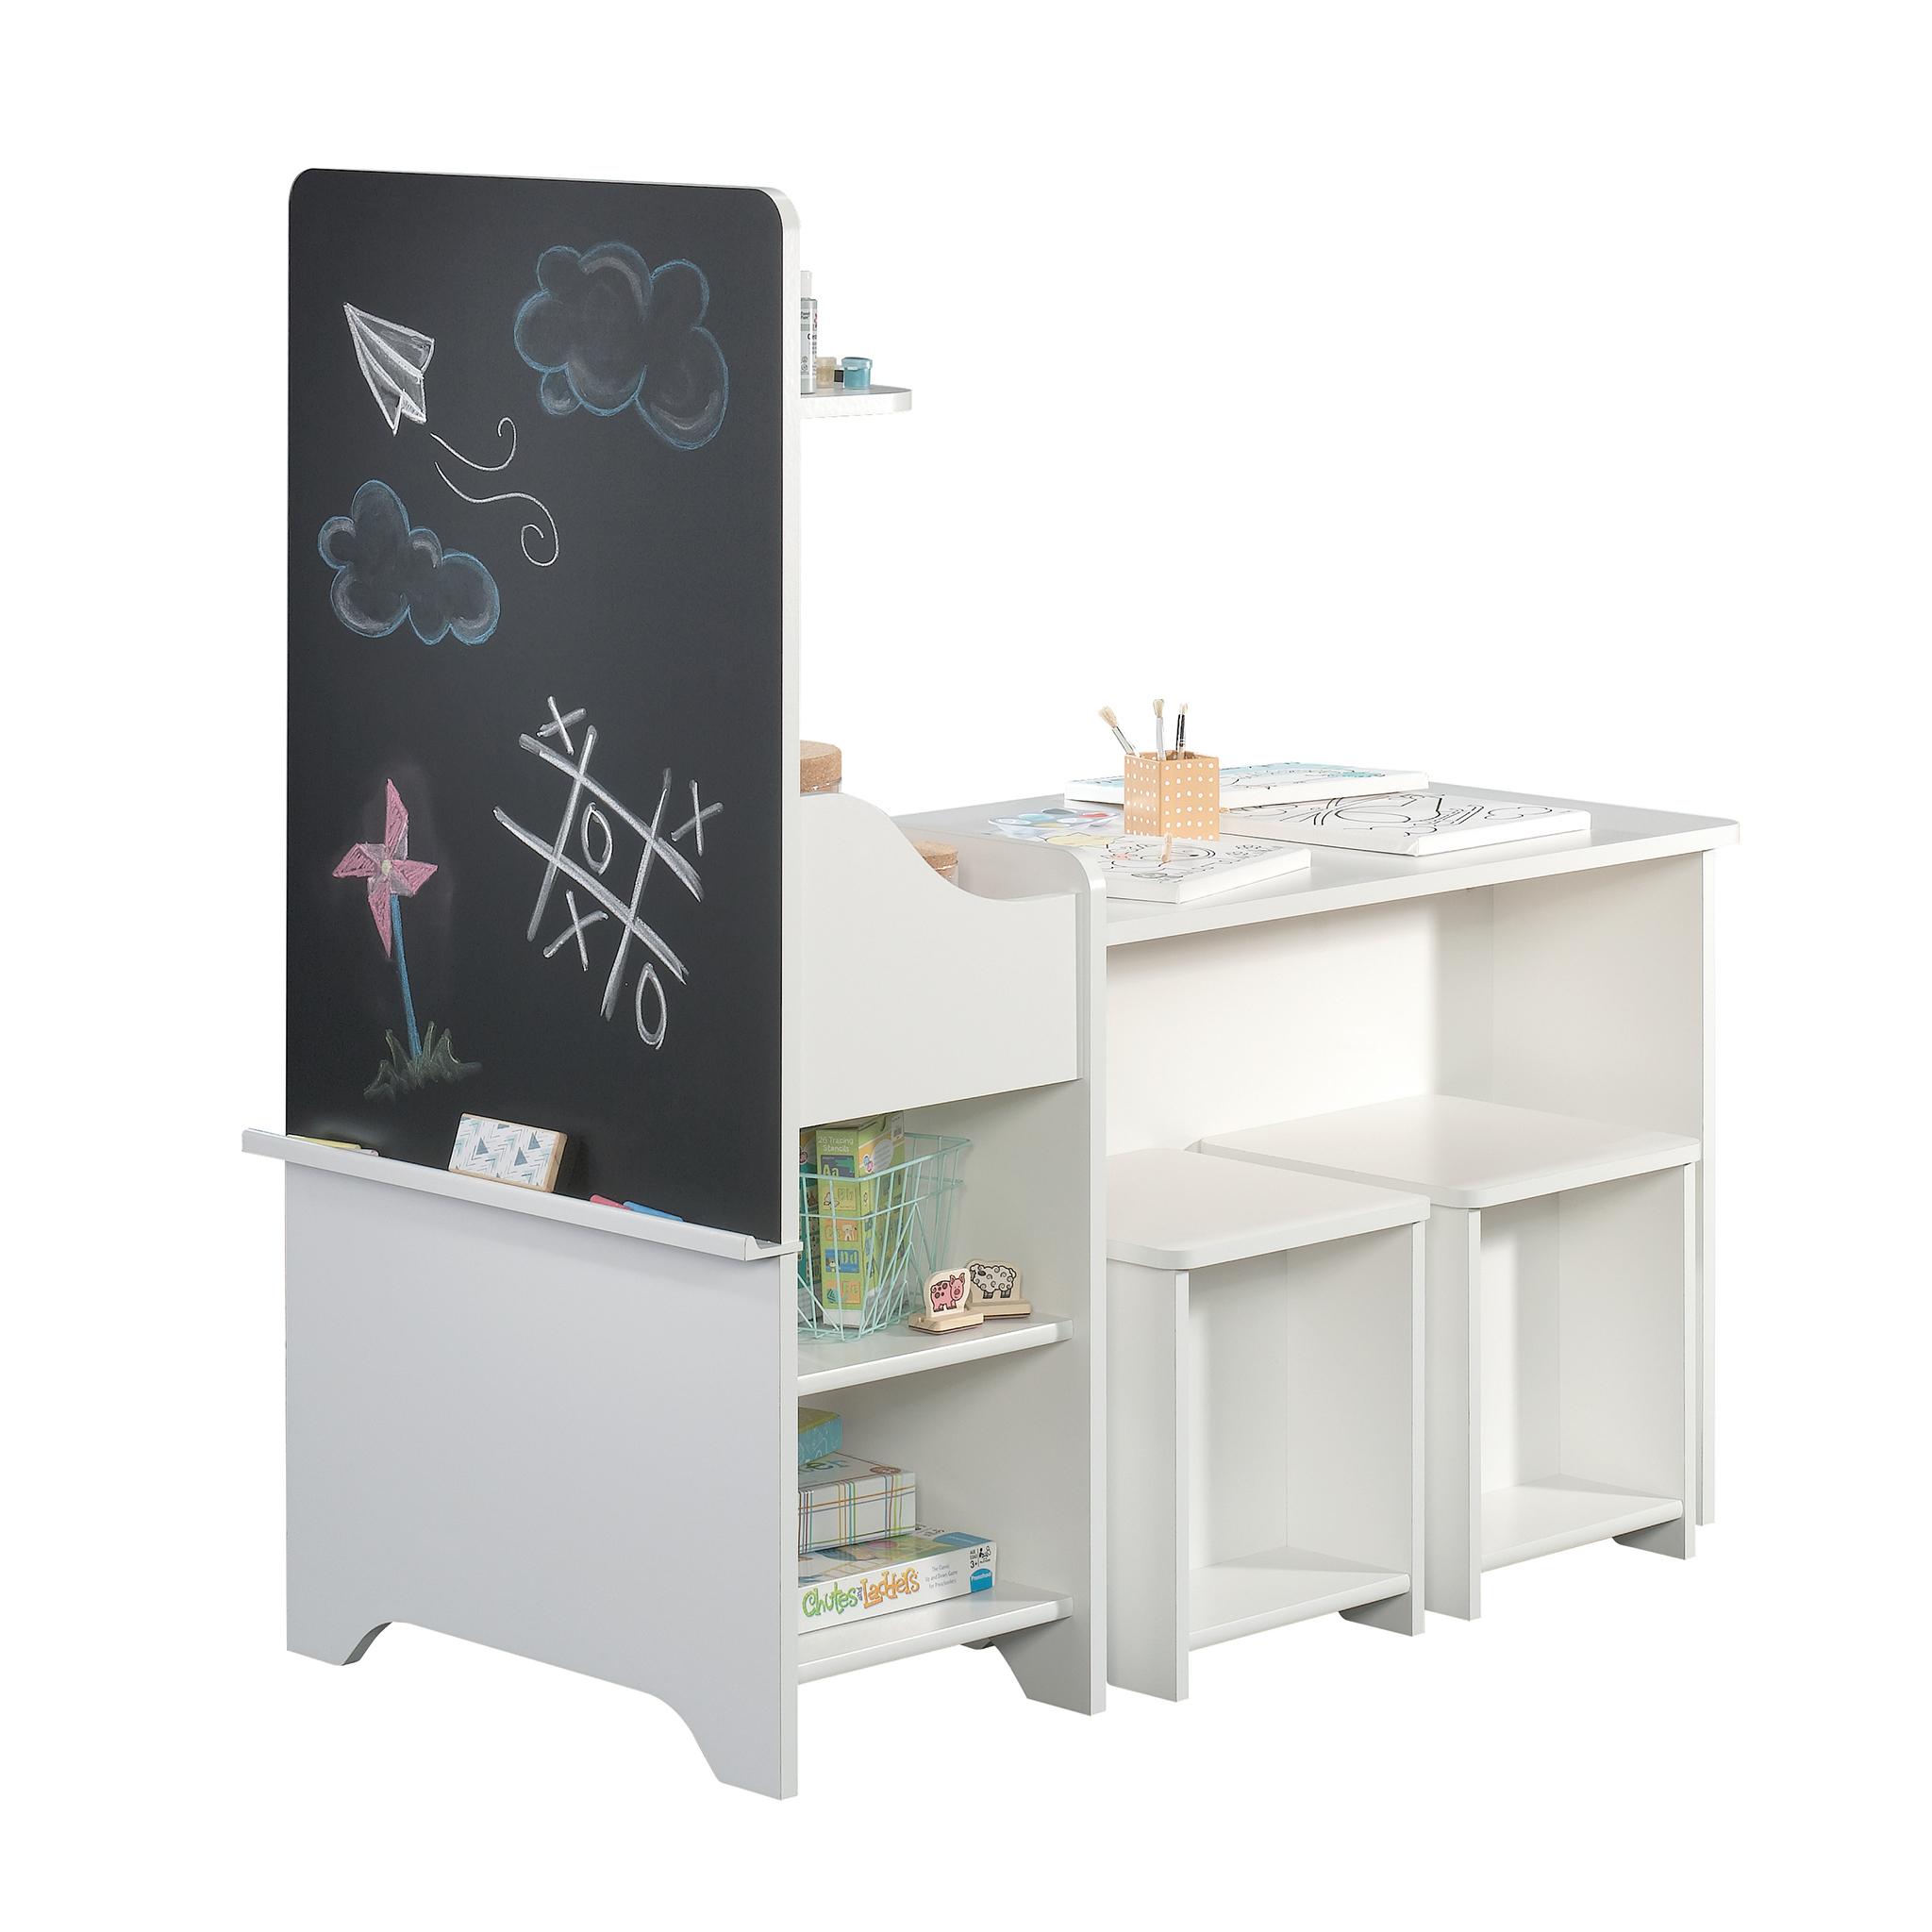 Better Homes & Gardens Cartwheel Activity Center with Chalkboard, White Finish